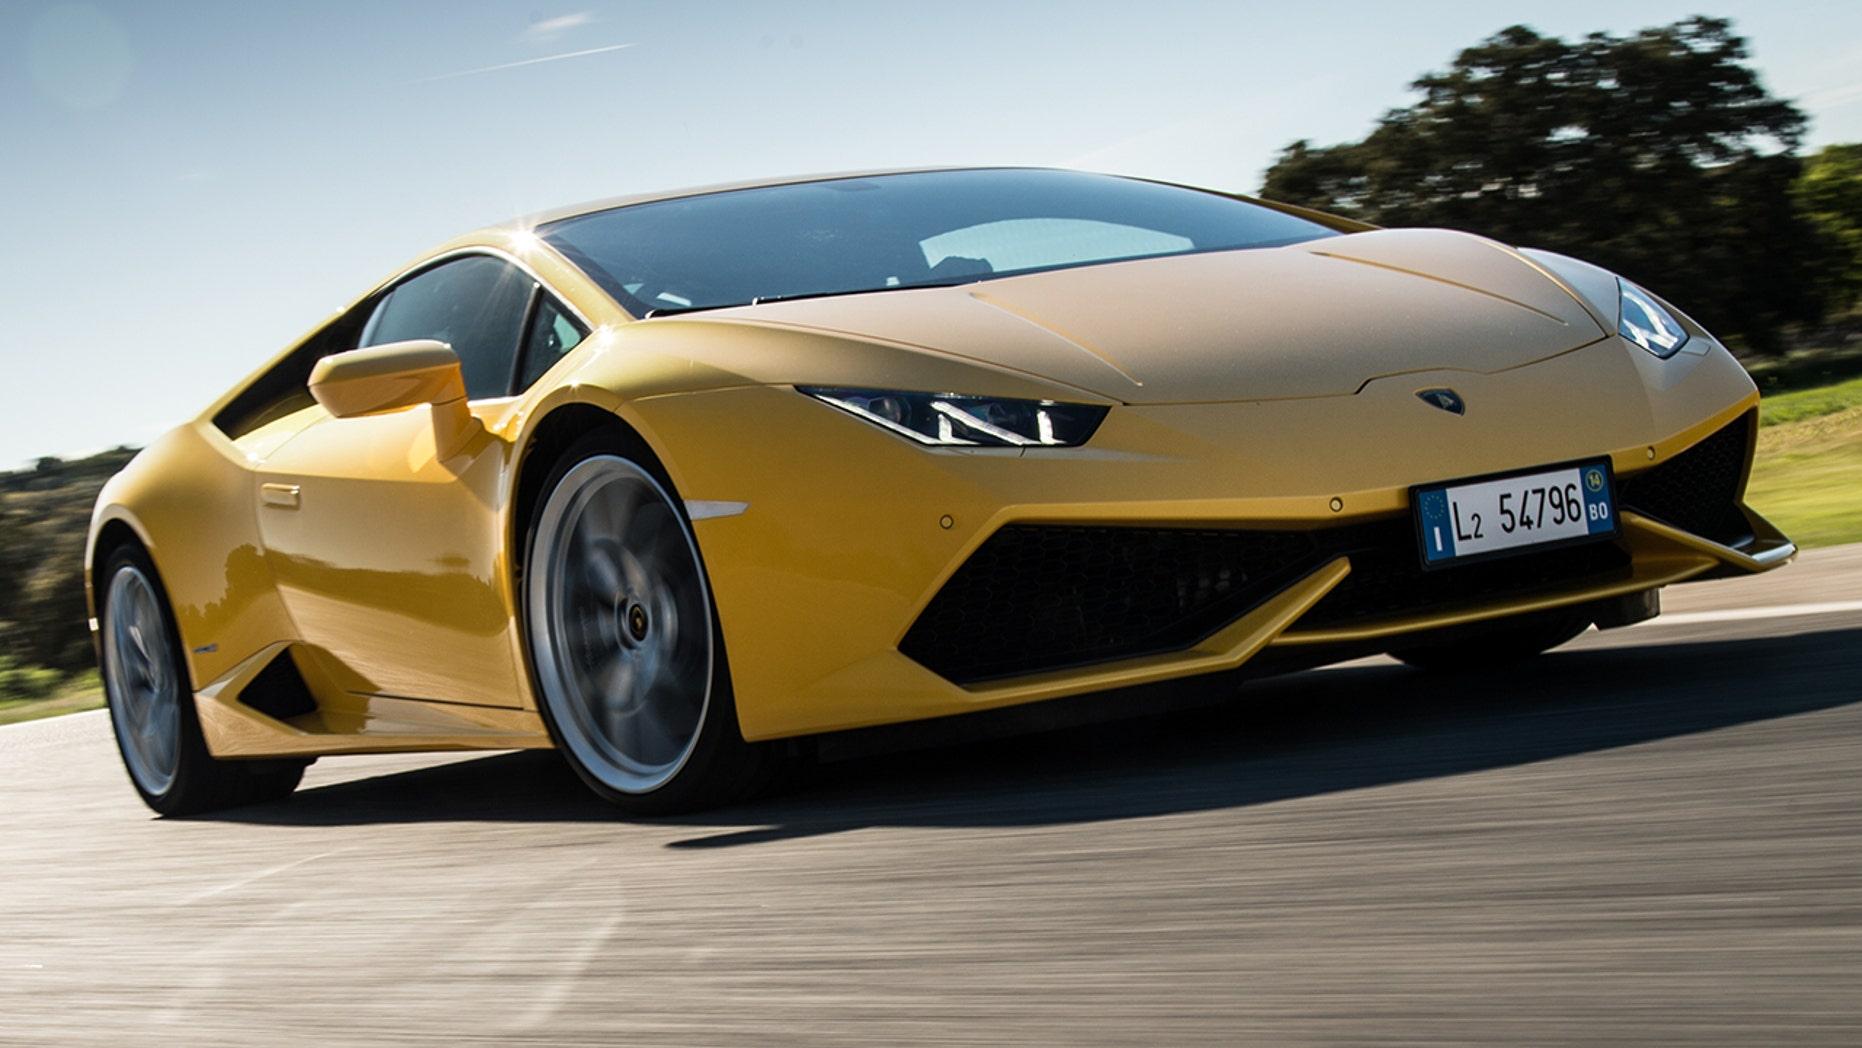 Dubai Tourist Racks Up 45 000 In Speeding Tickets In 4 Hours Fox News